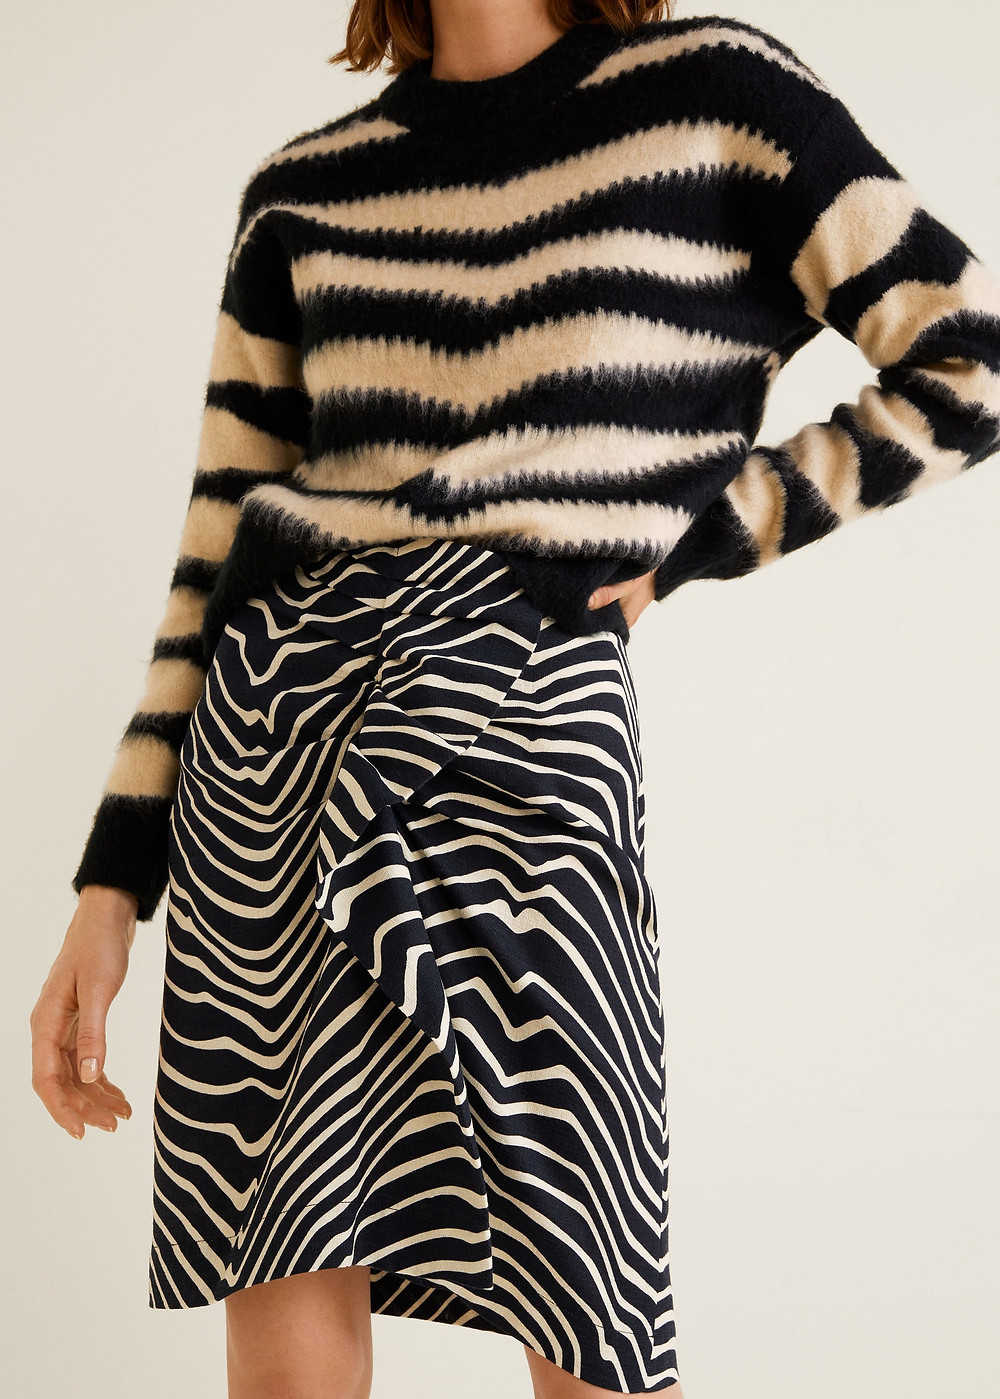 Mango Zebra print skirt $79.99